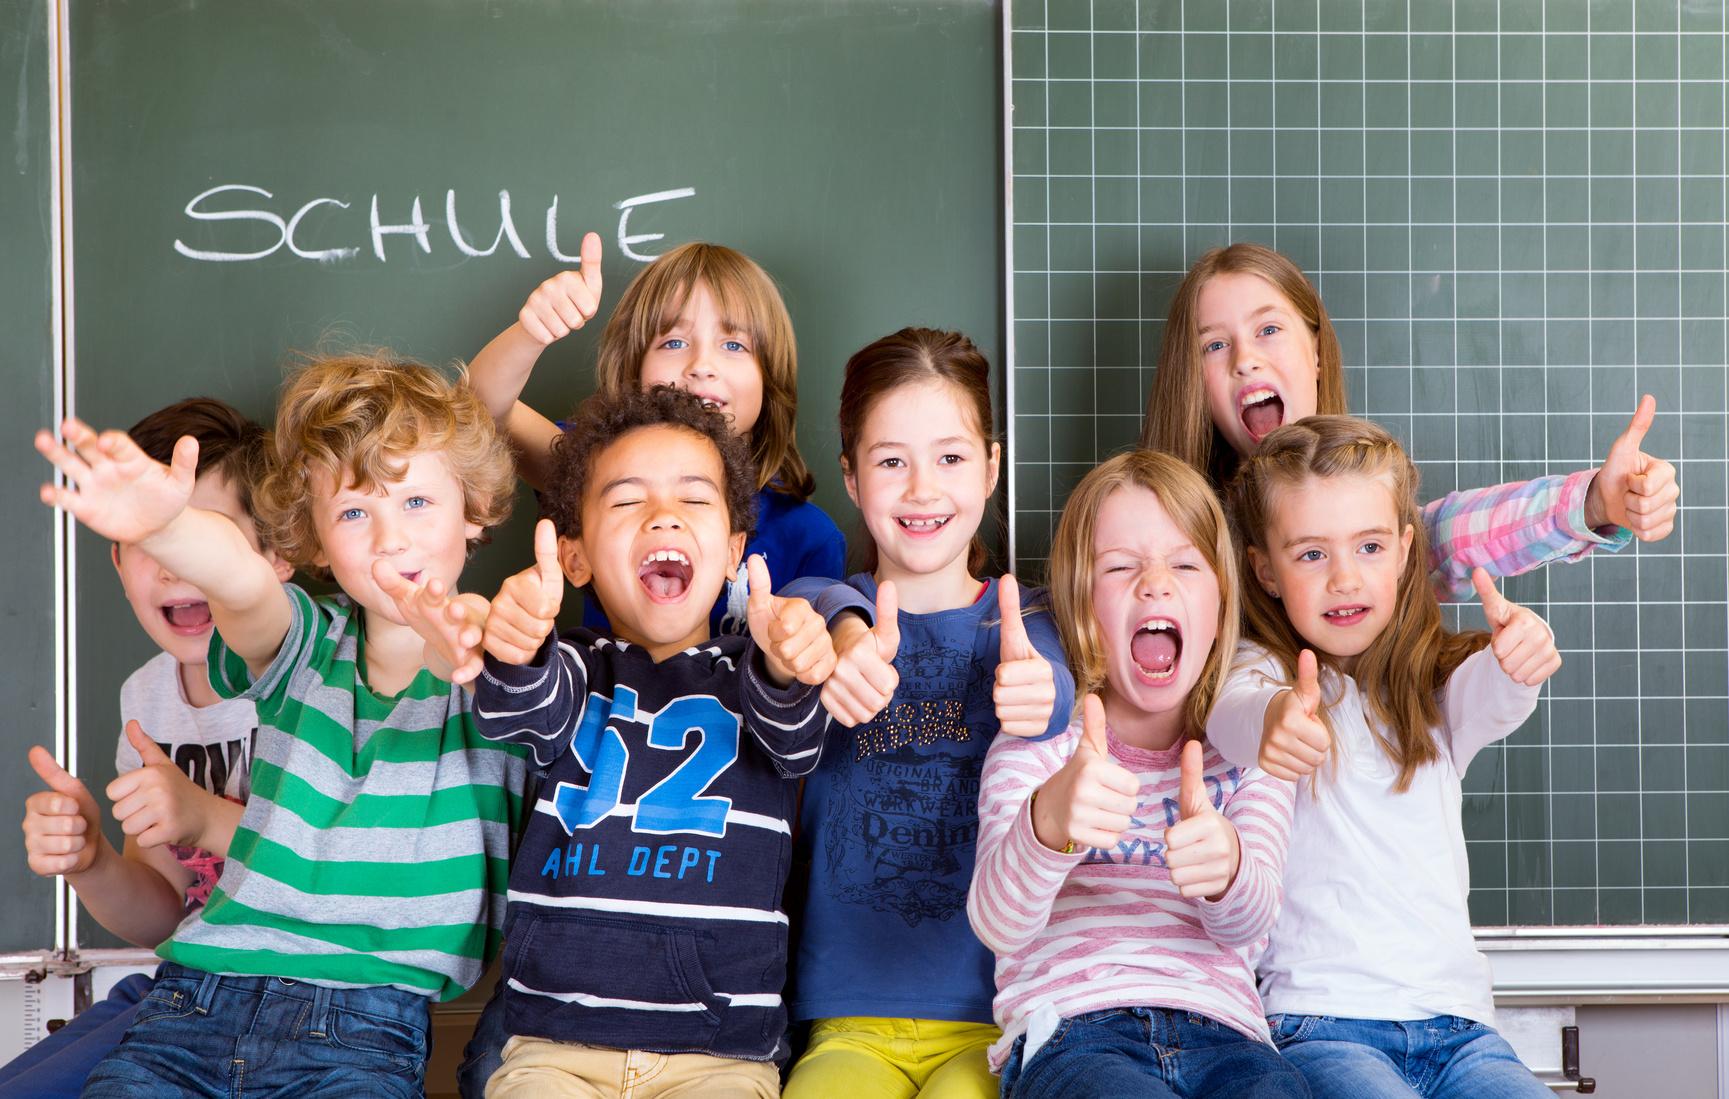 Rheuma: Kinder, Schulkinder freuen sich